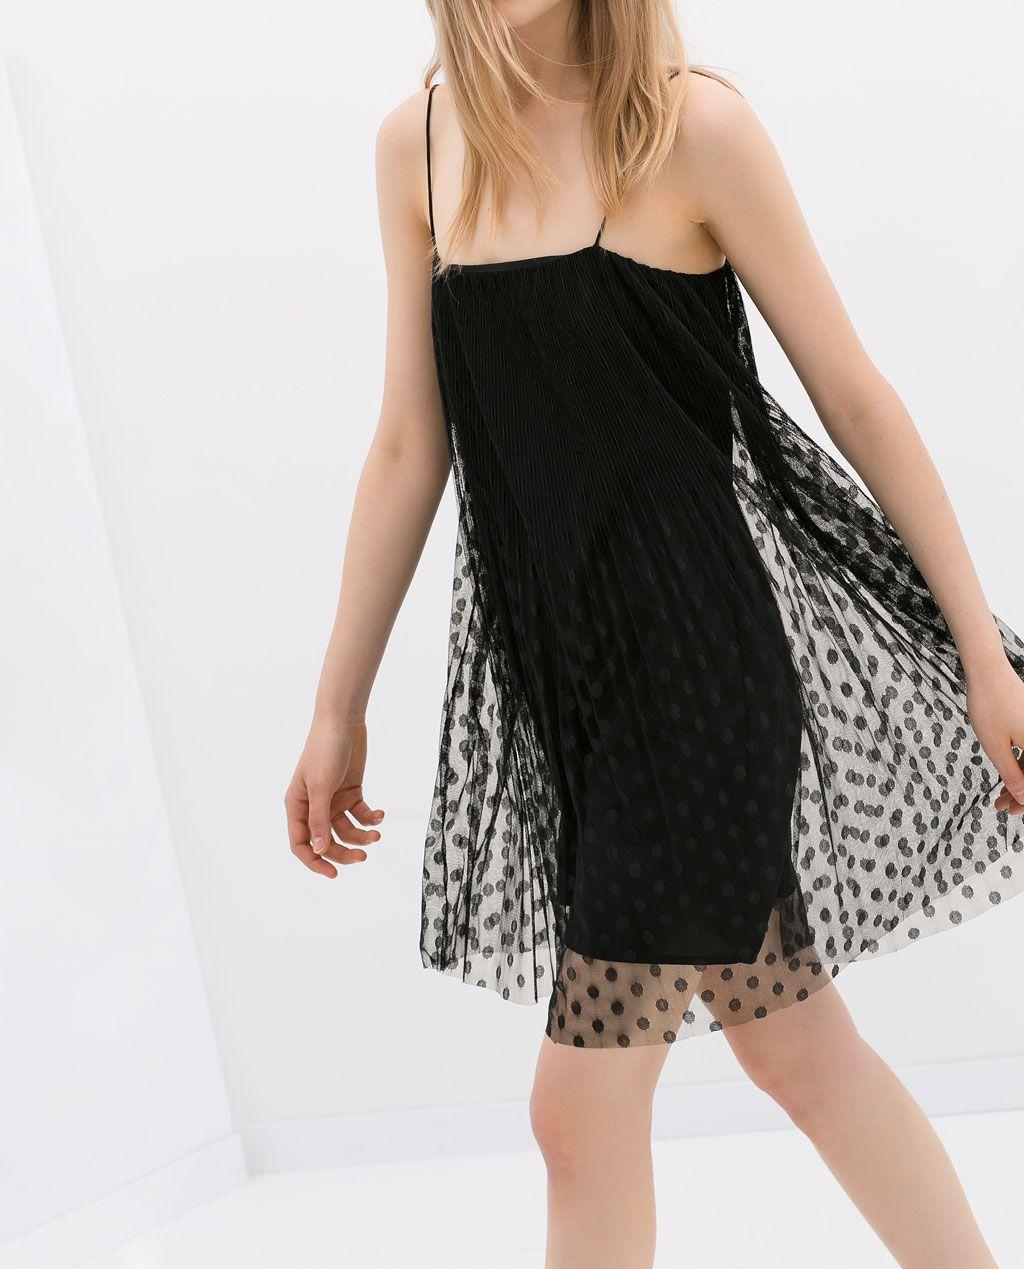 aa8e6731b4 Image 3 of SHEER OVERLAY DRESS from Zara